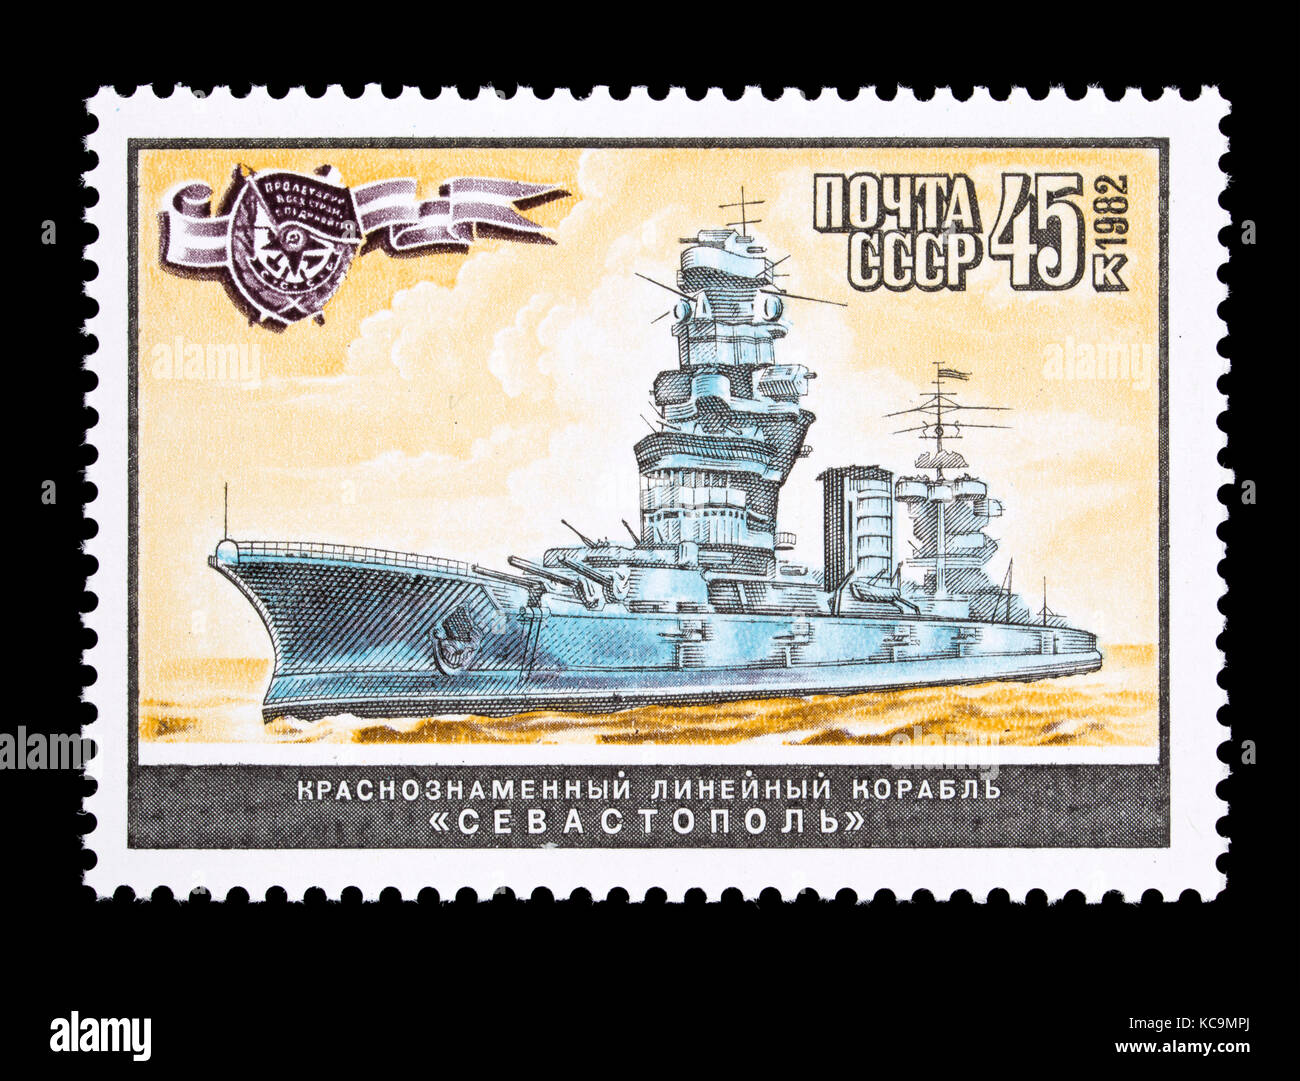 Postage stamp from the Soviet Union depicting the warship  Sebastopol - Stock Image